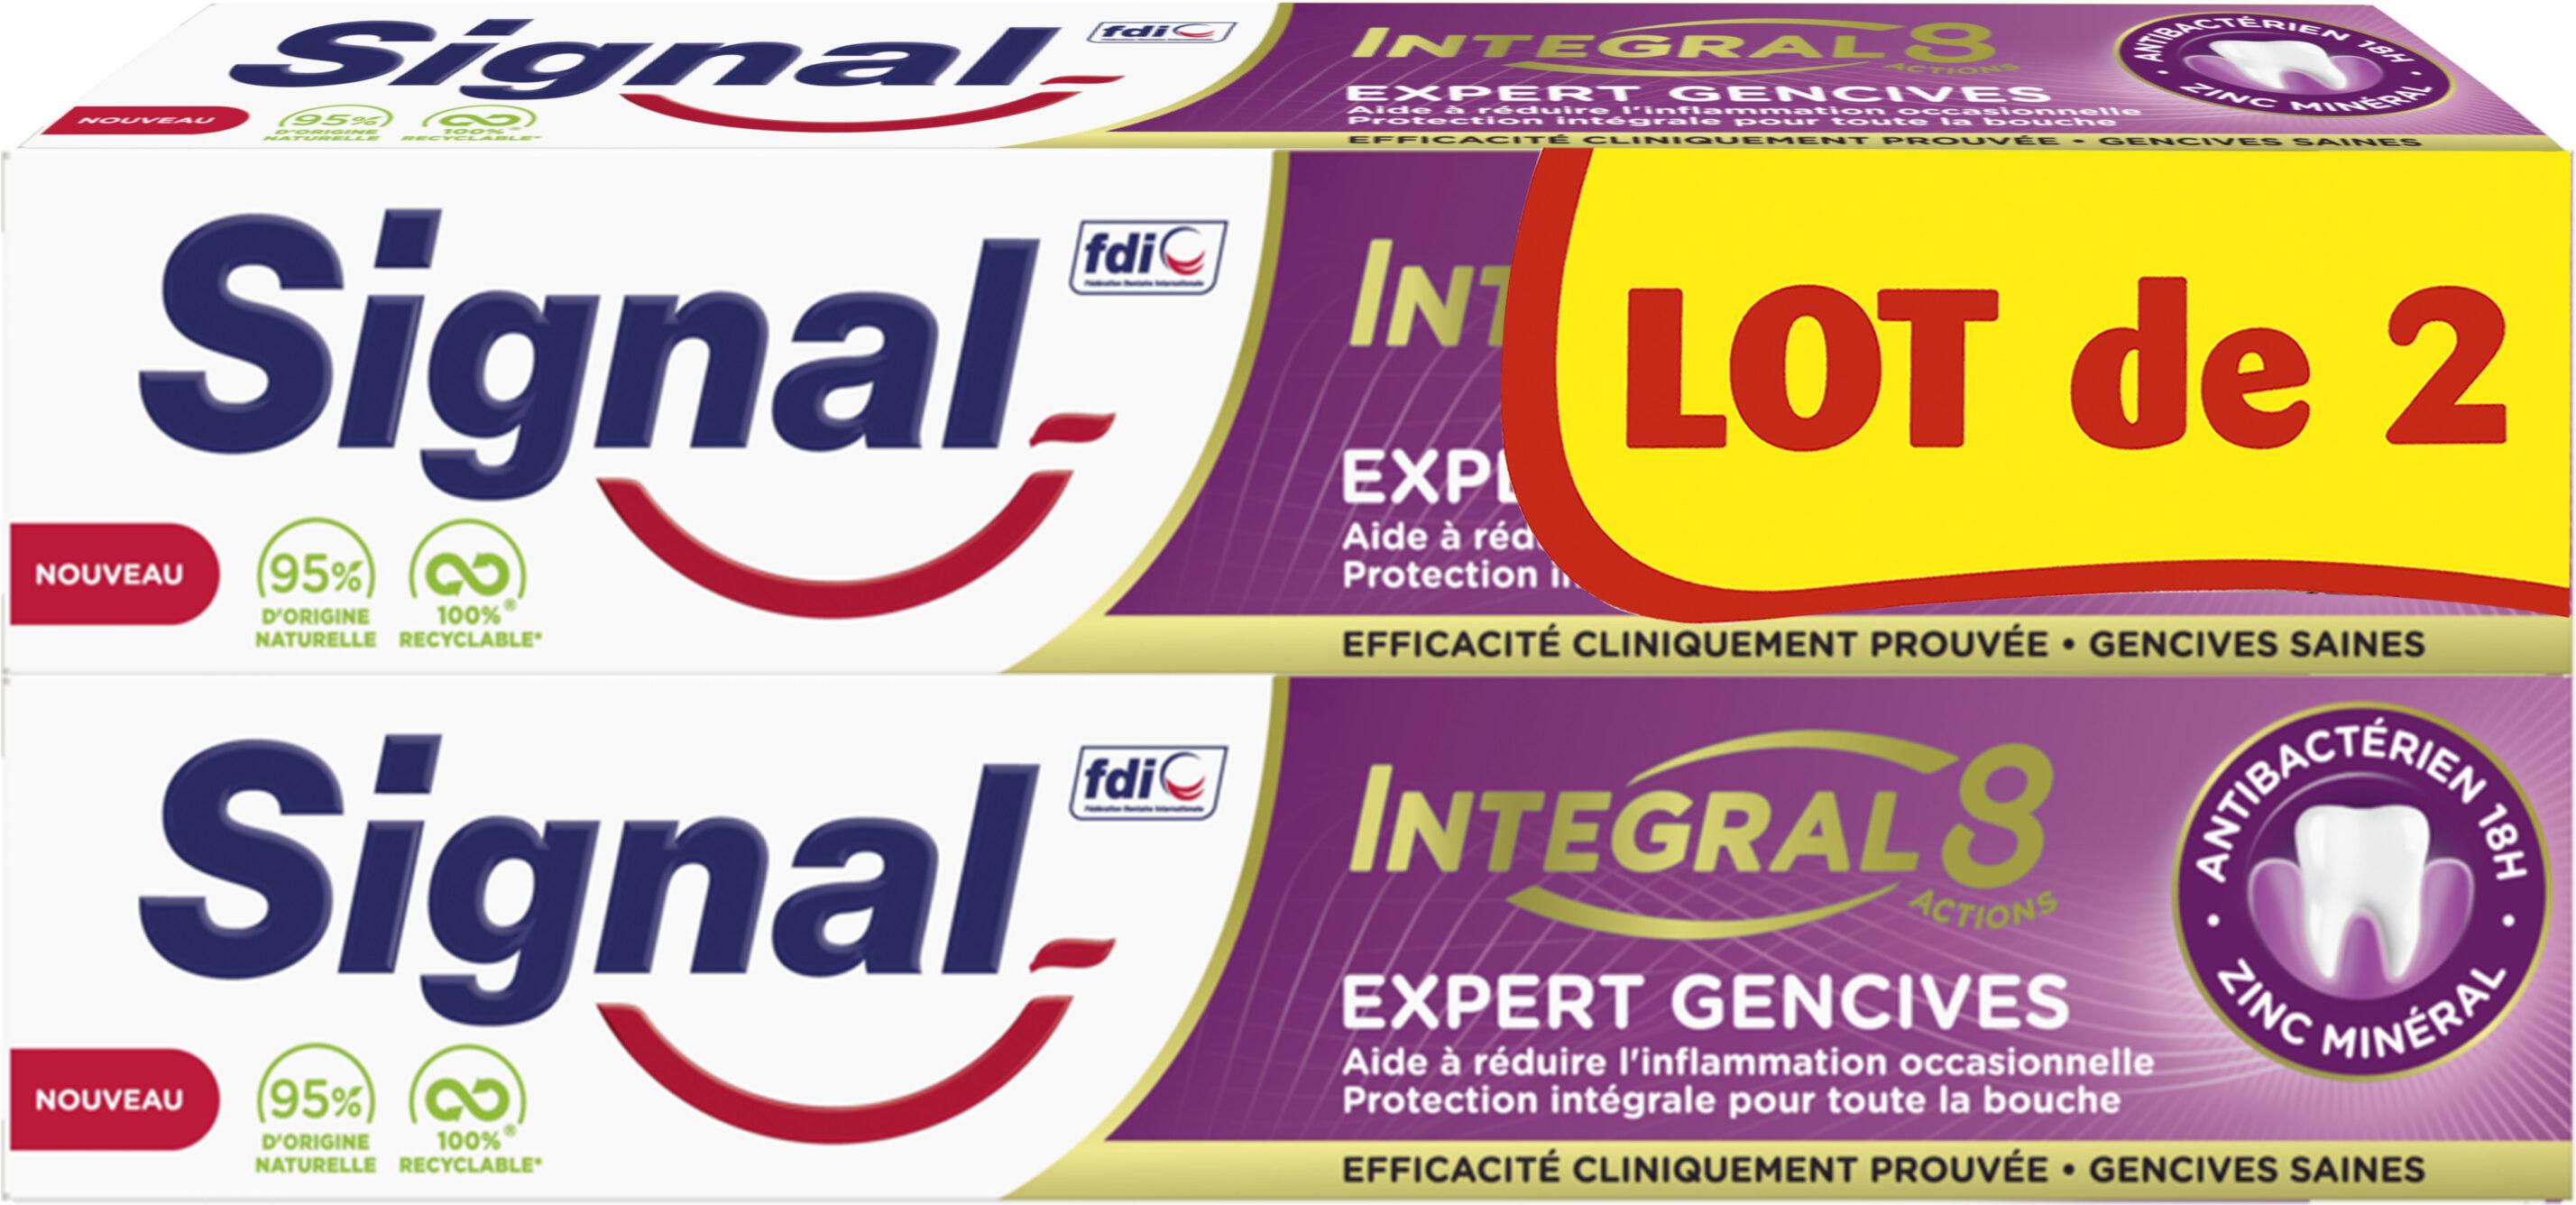 Signal Integral 8 Dentifrice Expert Gencives 2x75ml - Produit - fr